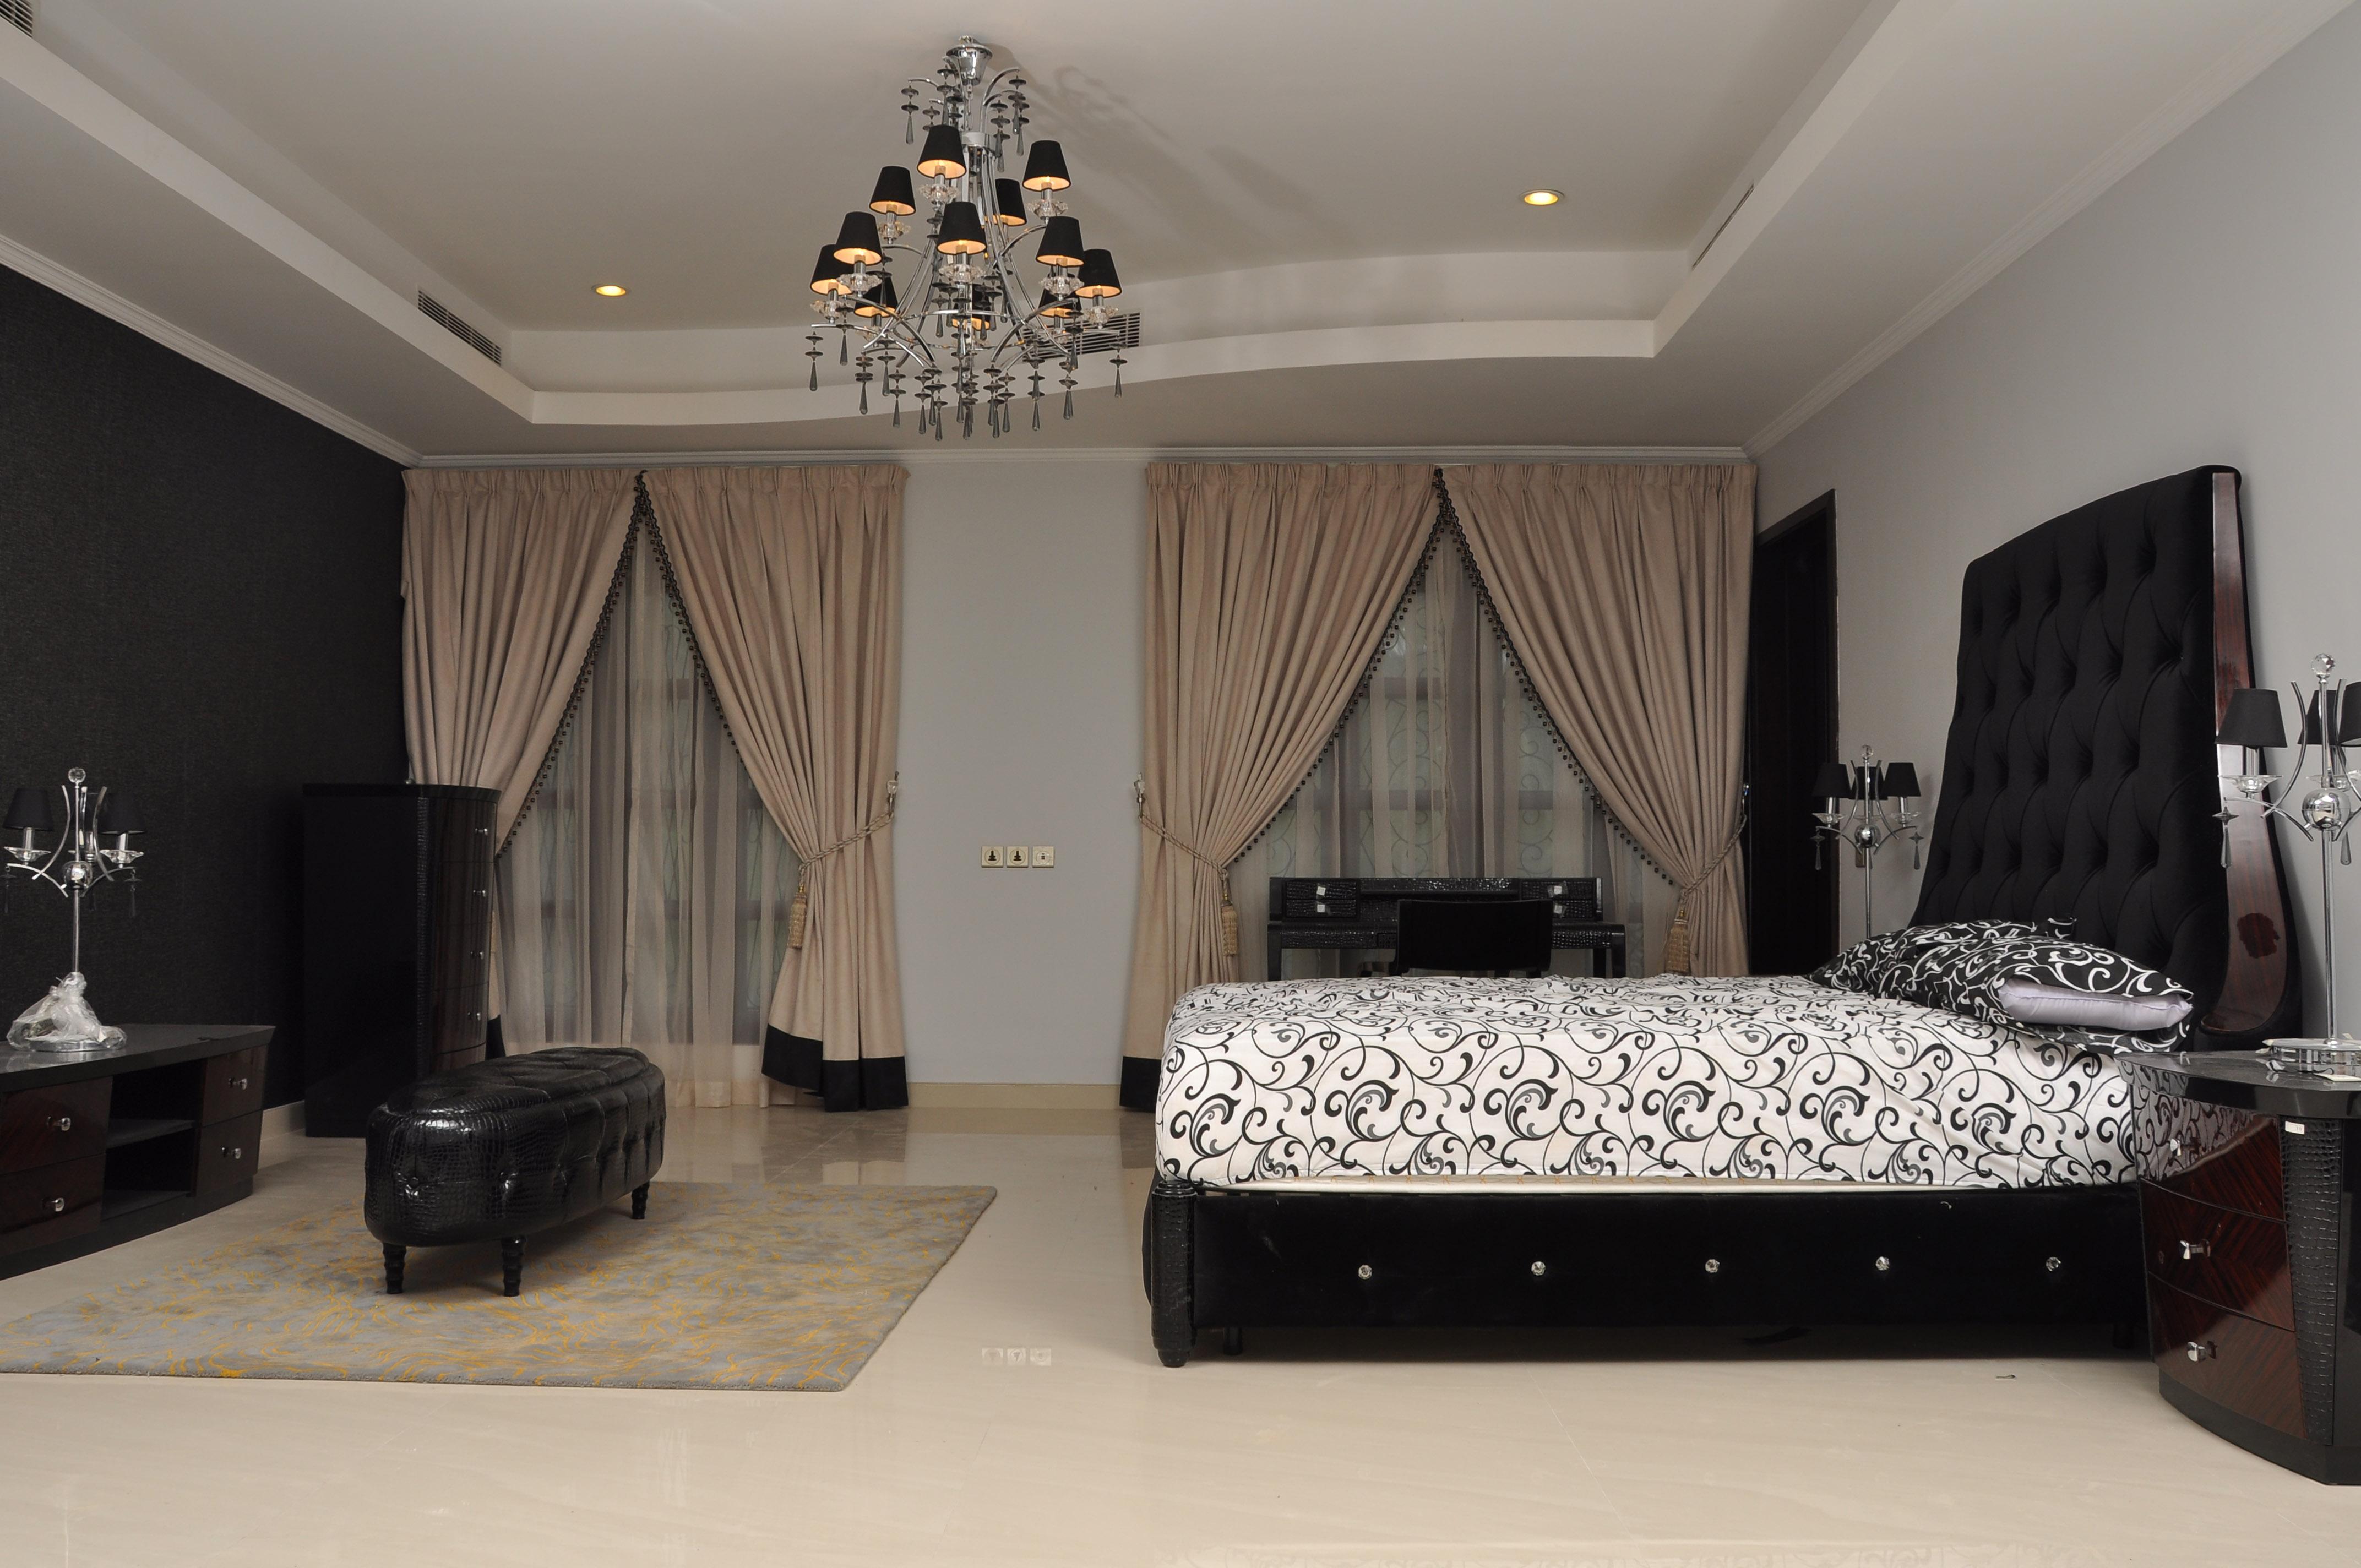 Royal Bedroom, Architect, Images, Stock, Royal, HQ Photo